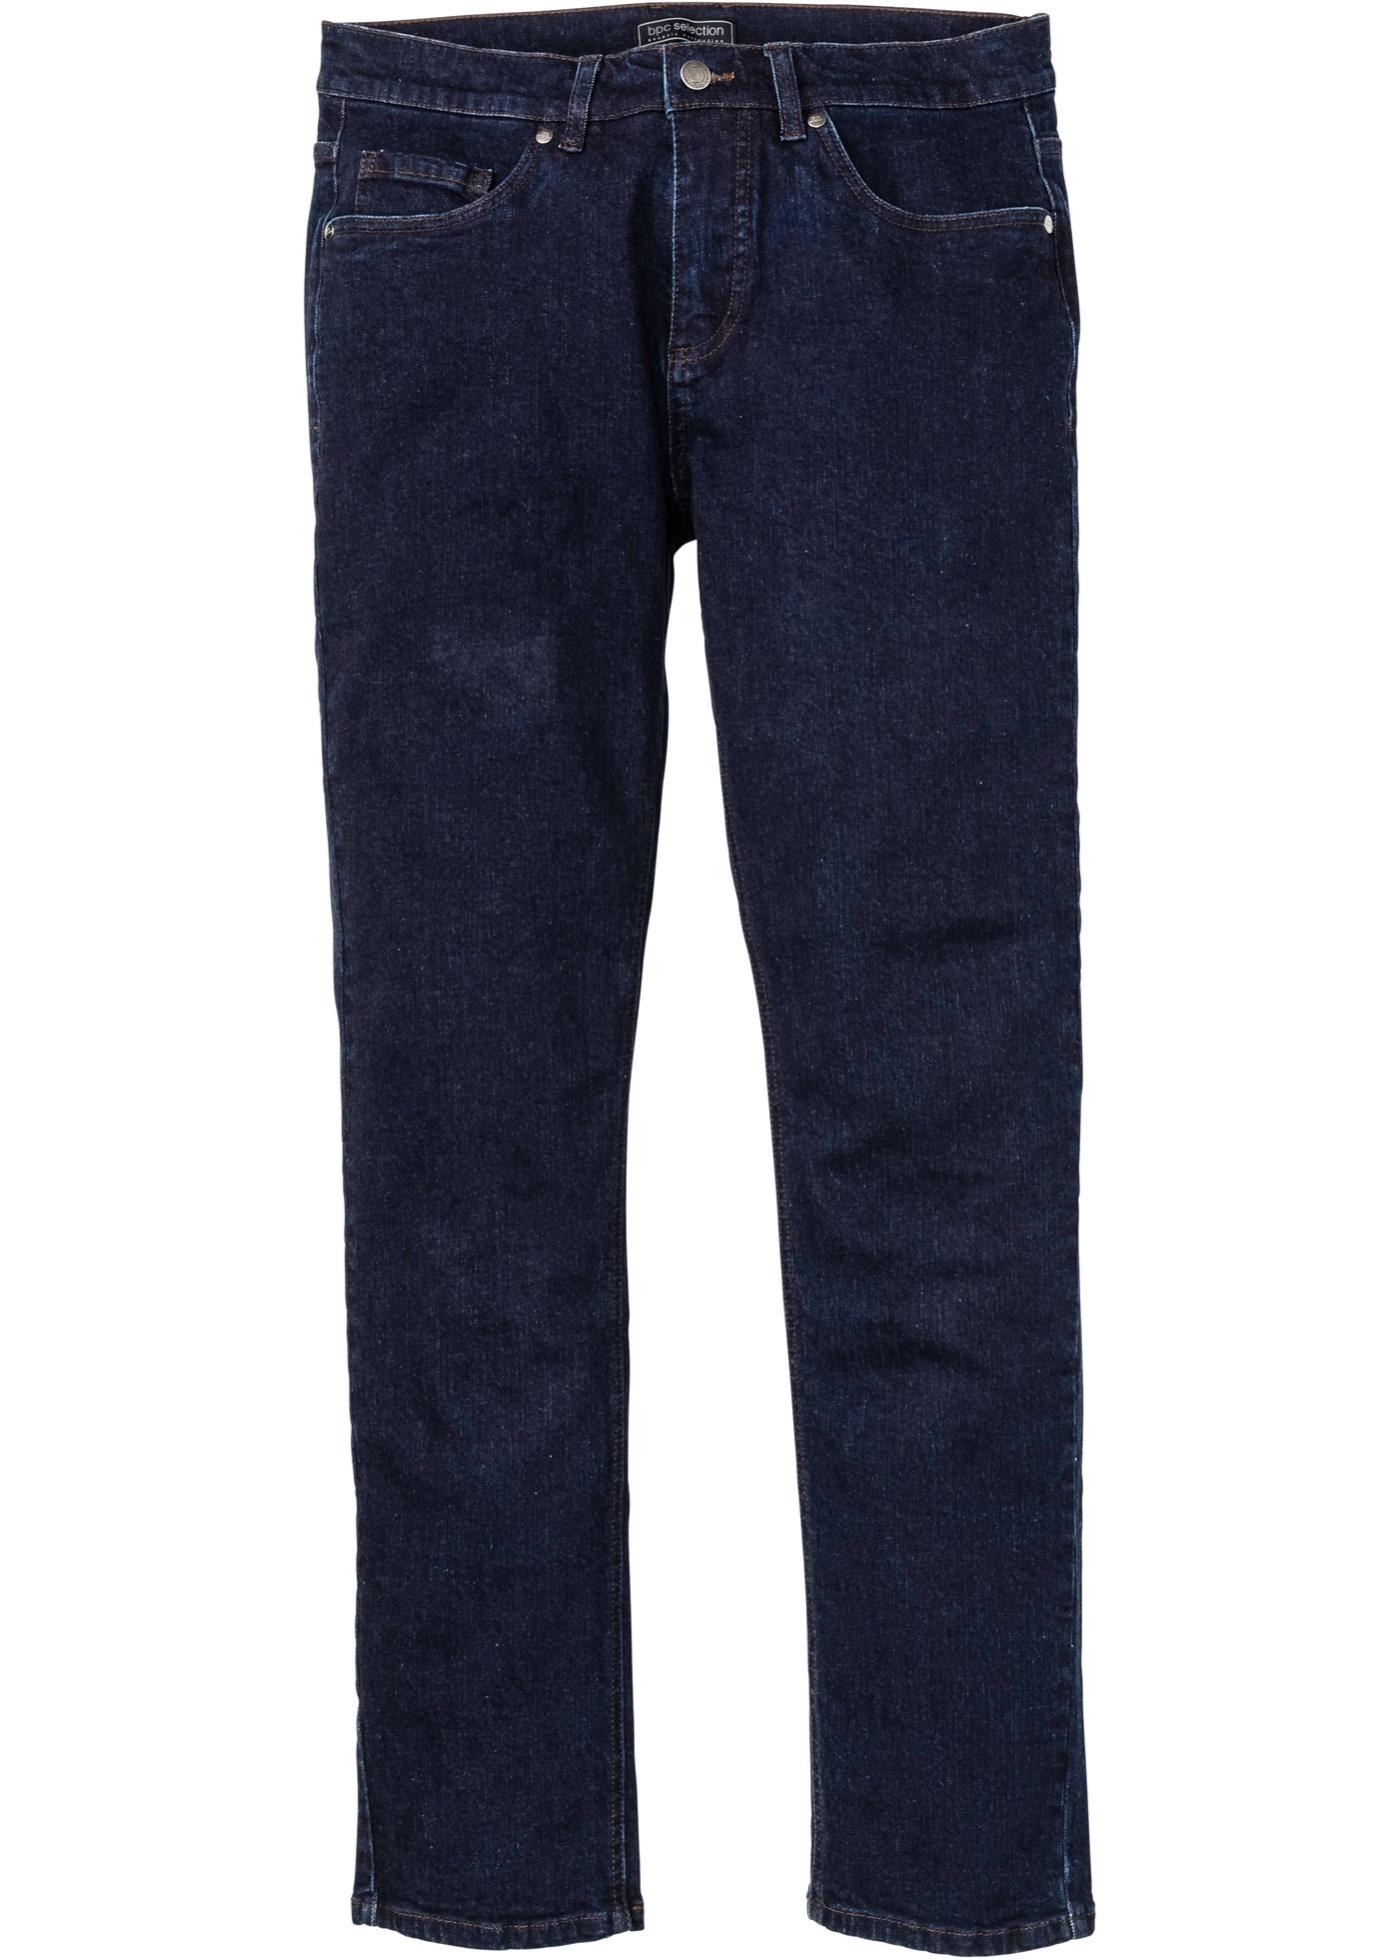 Bonprix - Jeans, 5-ficksmodell, smal passform 349.00